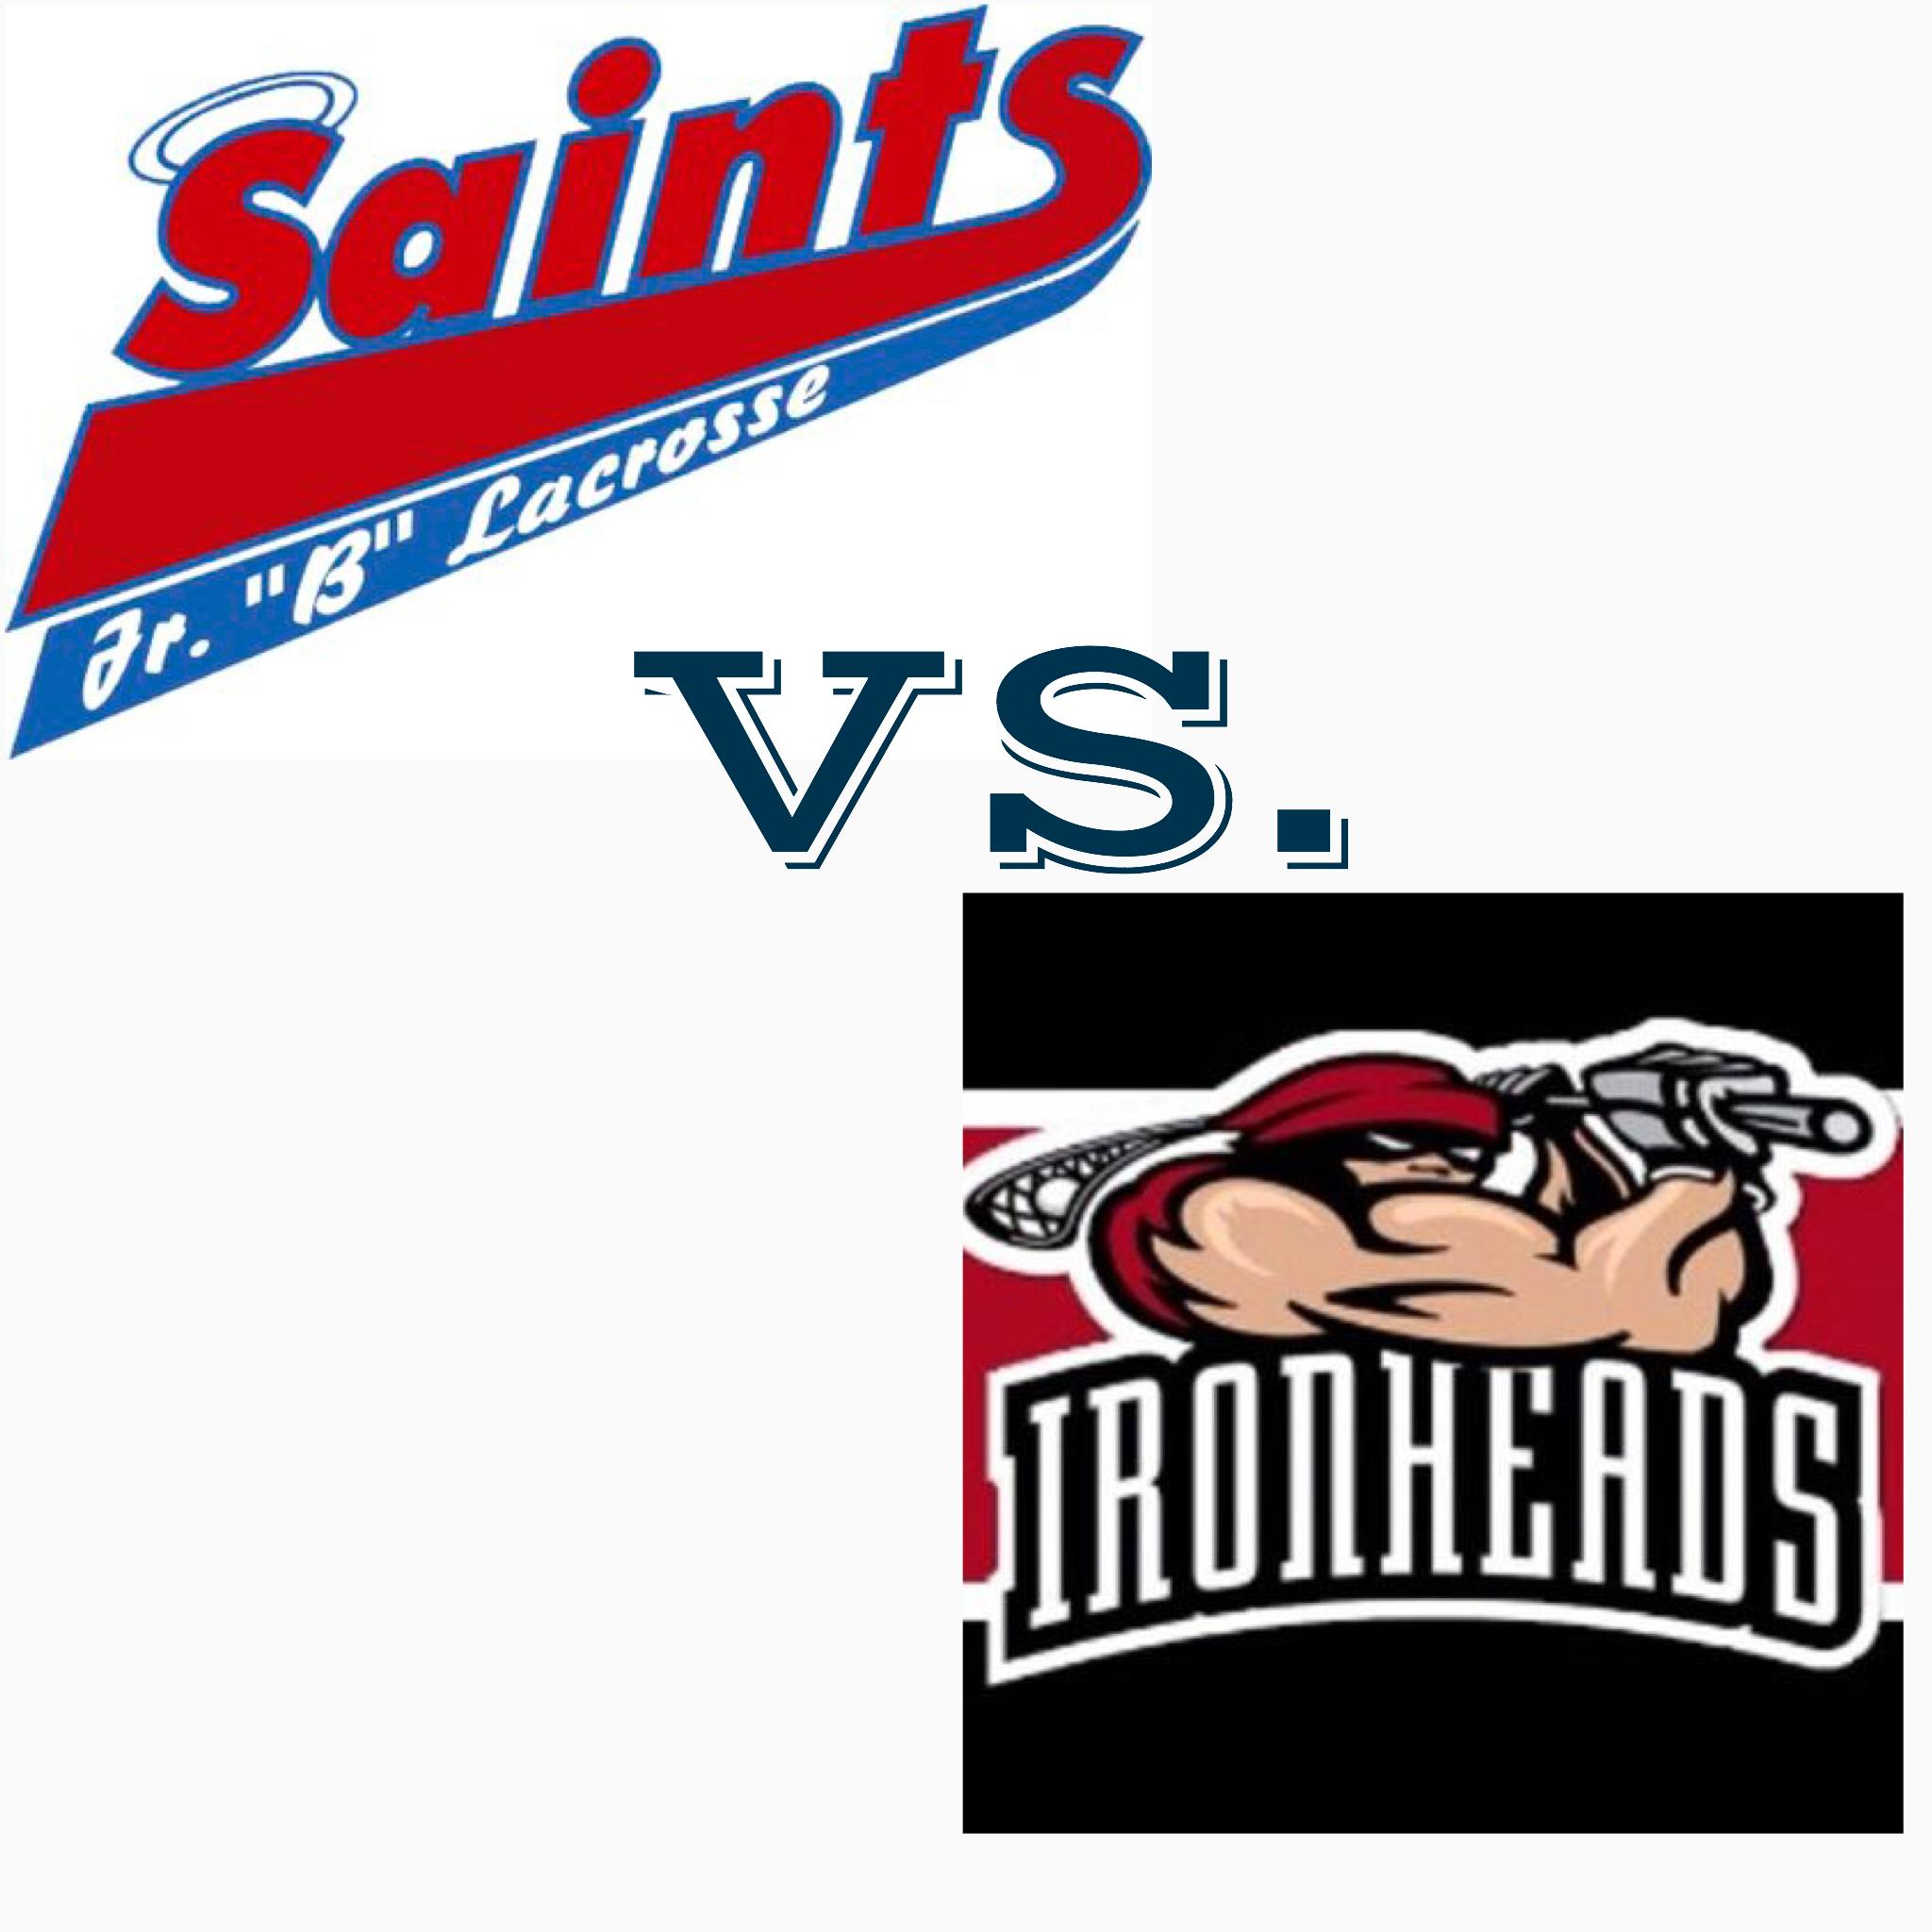 Saints-Ironheads Logos.jpg